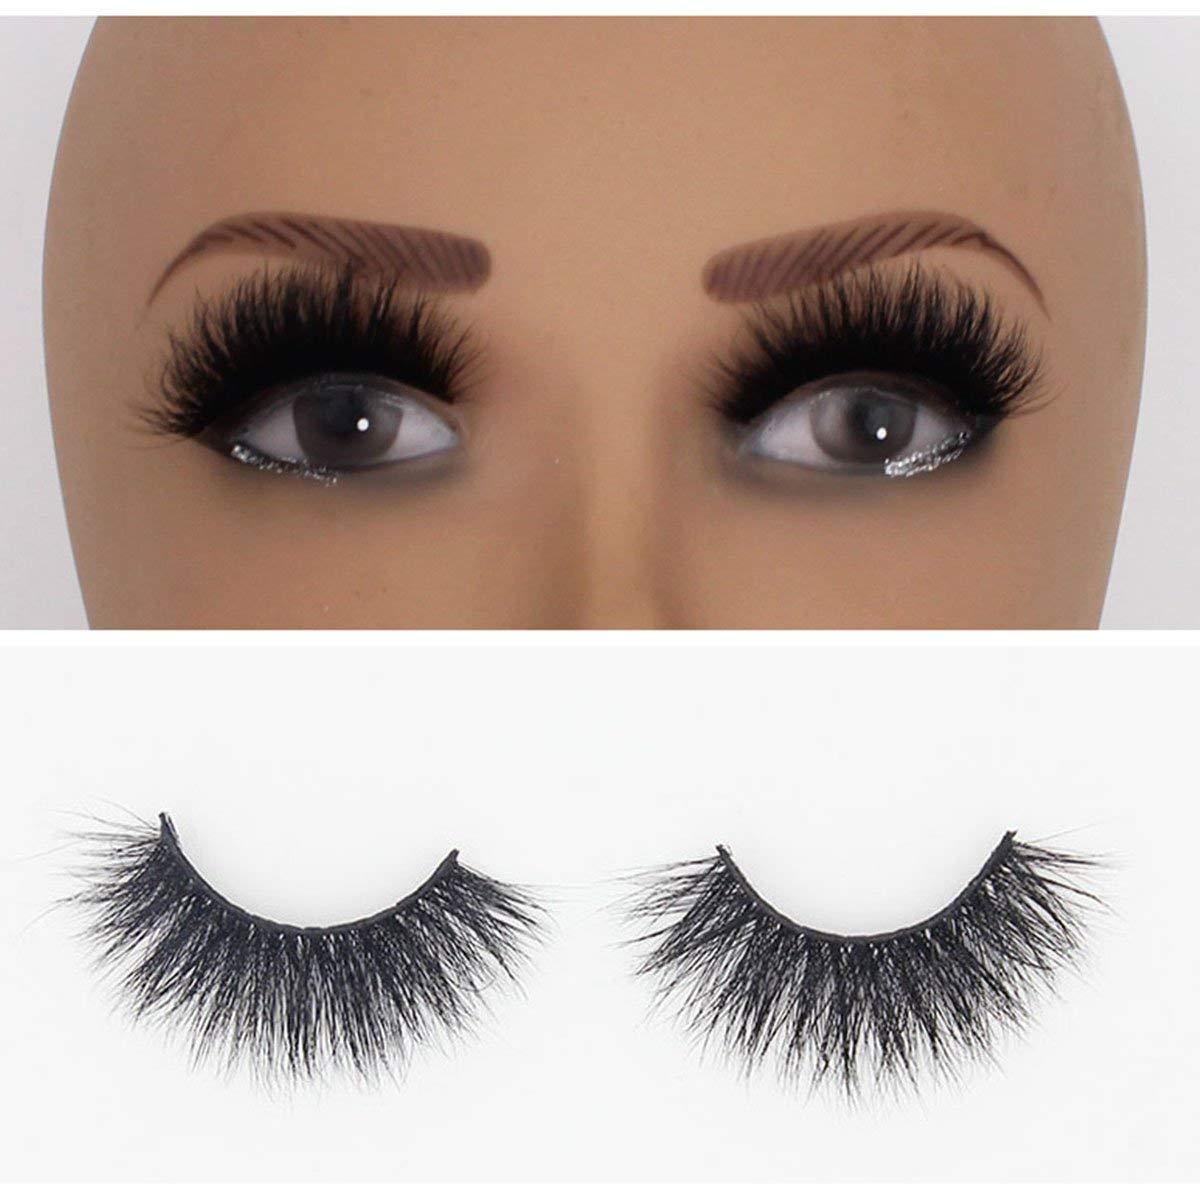 1659dad6009 Get Quotations · SD70 3D Mink Eyelashes Natural False Eyelashes Makeup  Strip Eyelashes 100% Fur Fake Eyelashes Hand